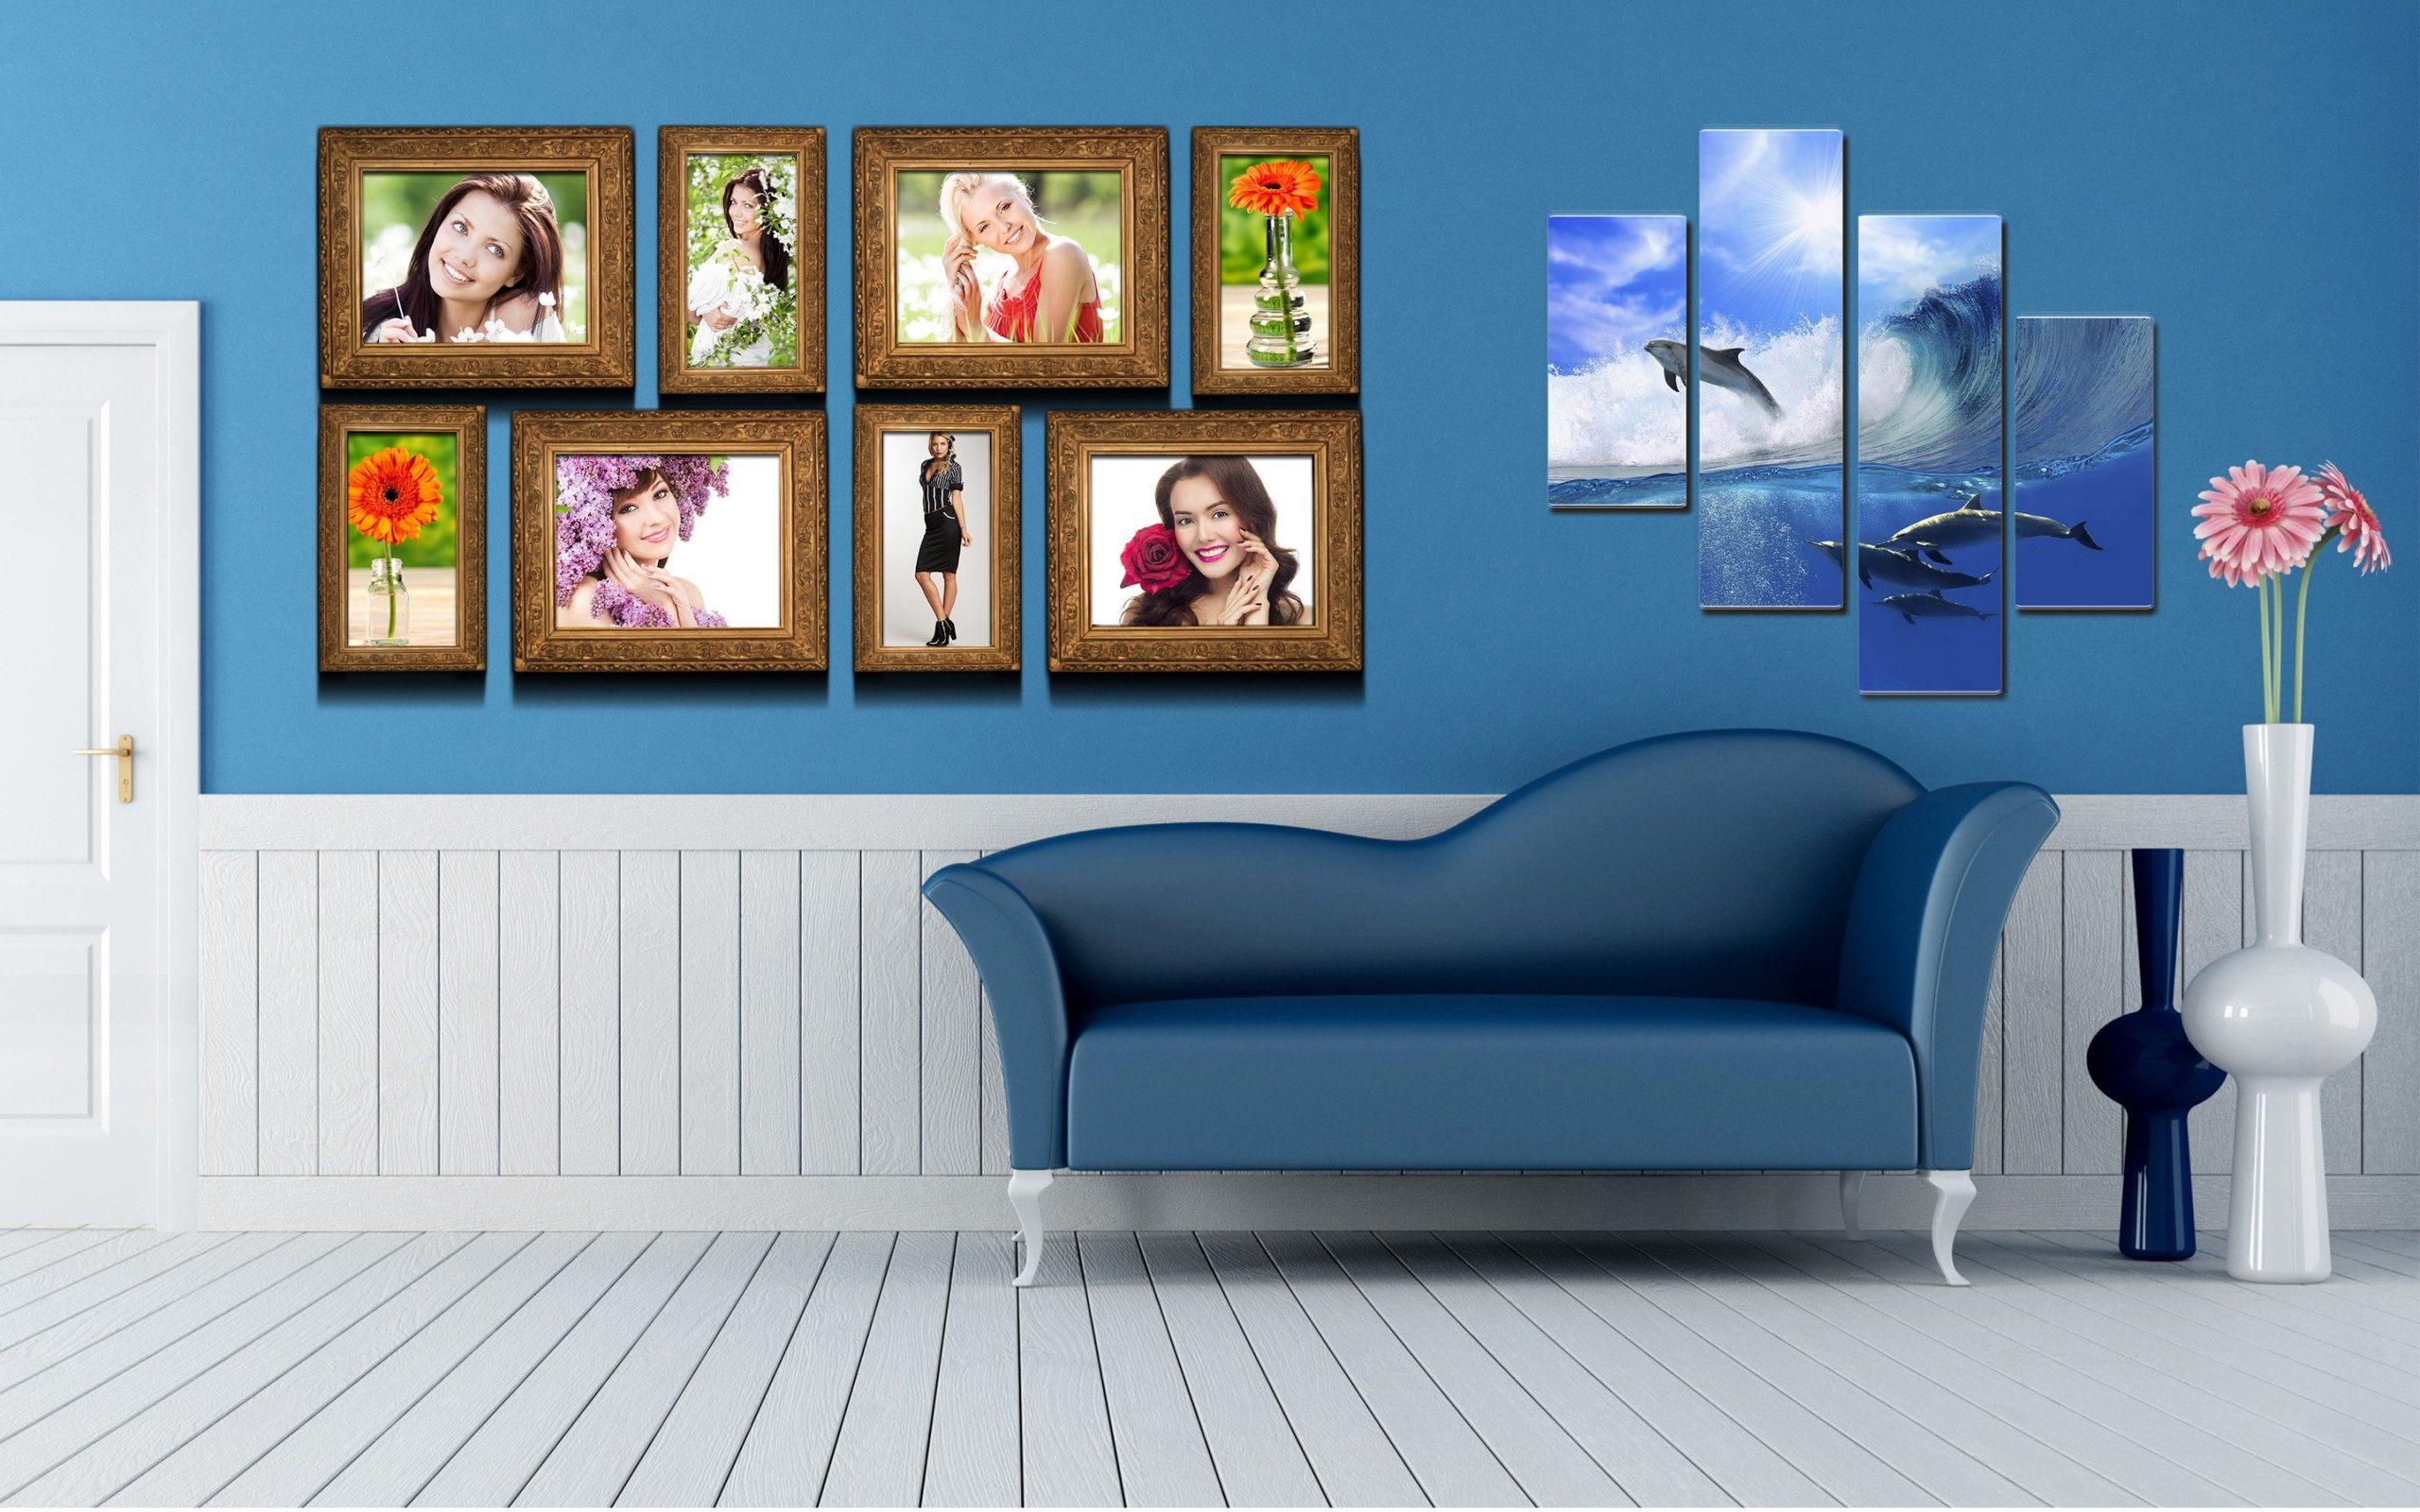 chair design wallpaper child rocking room wallpapers hd free download pixelstalk net living